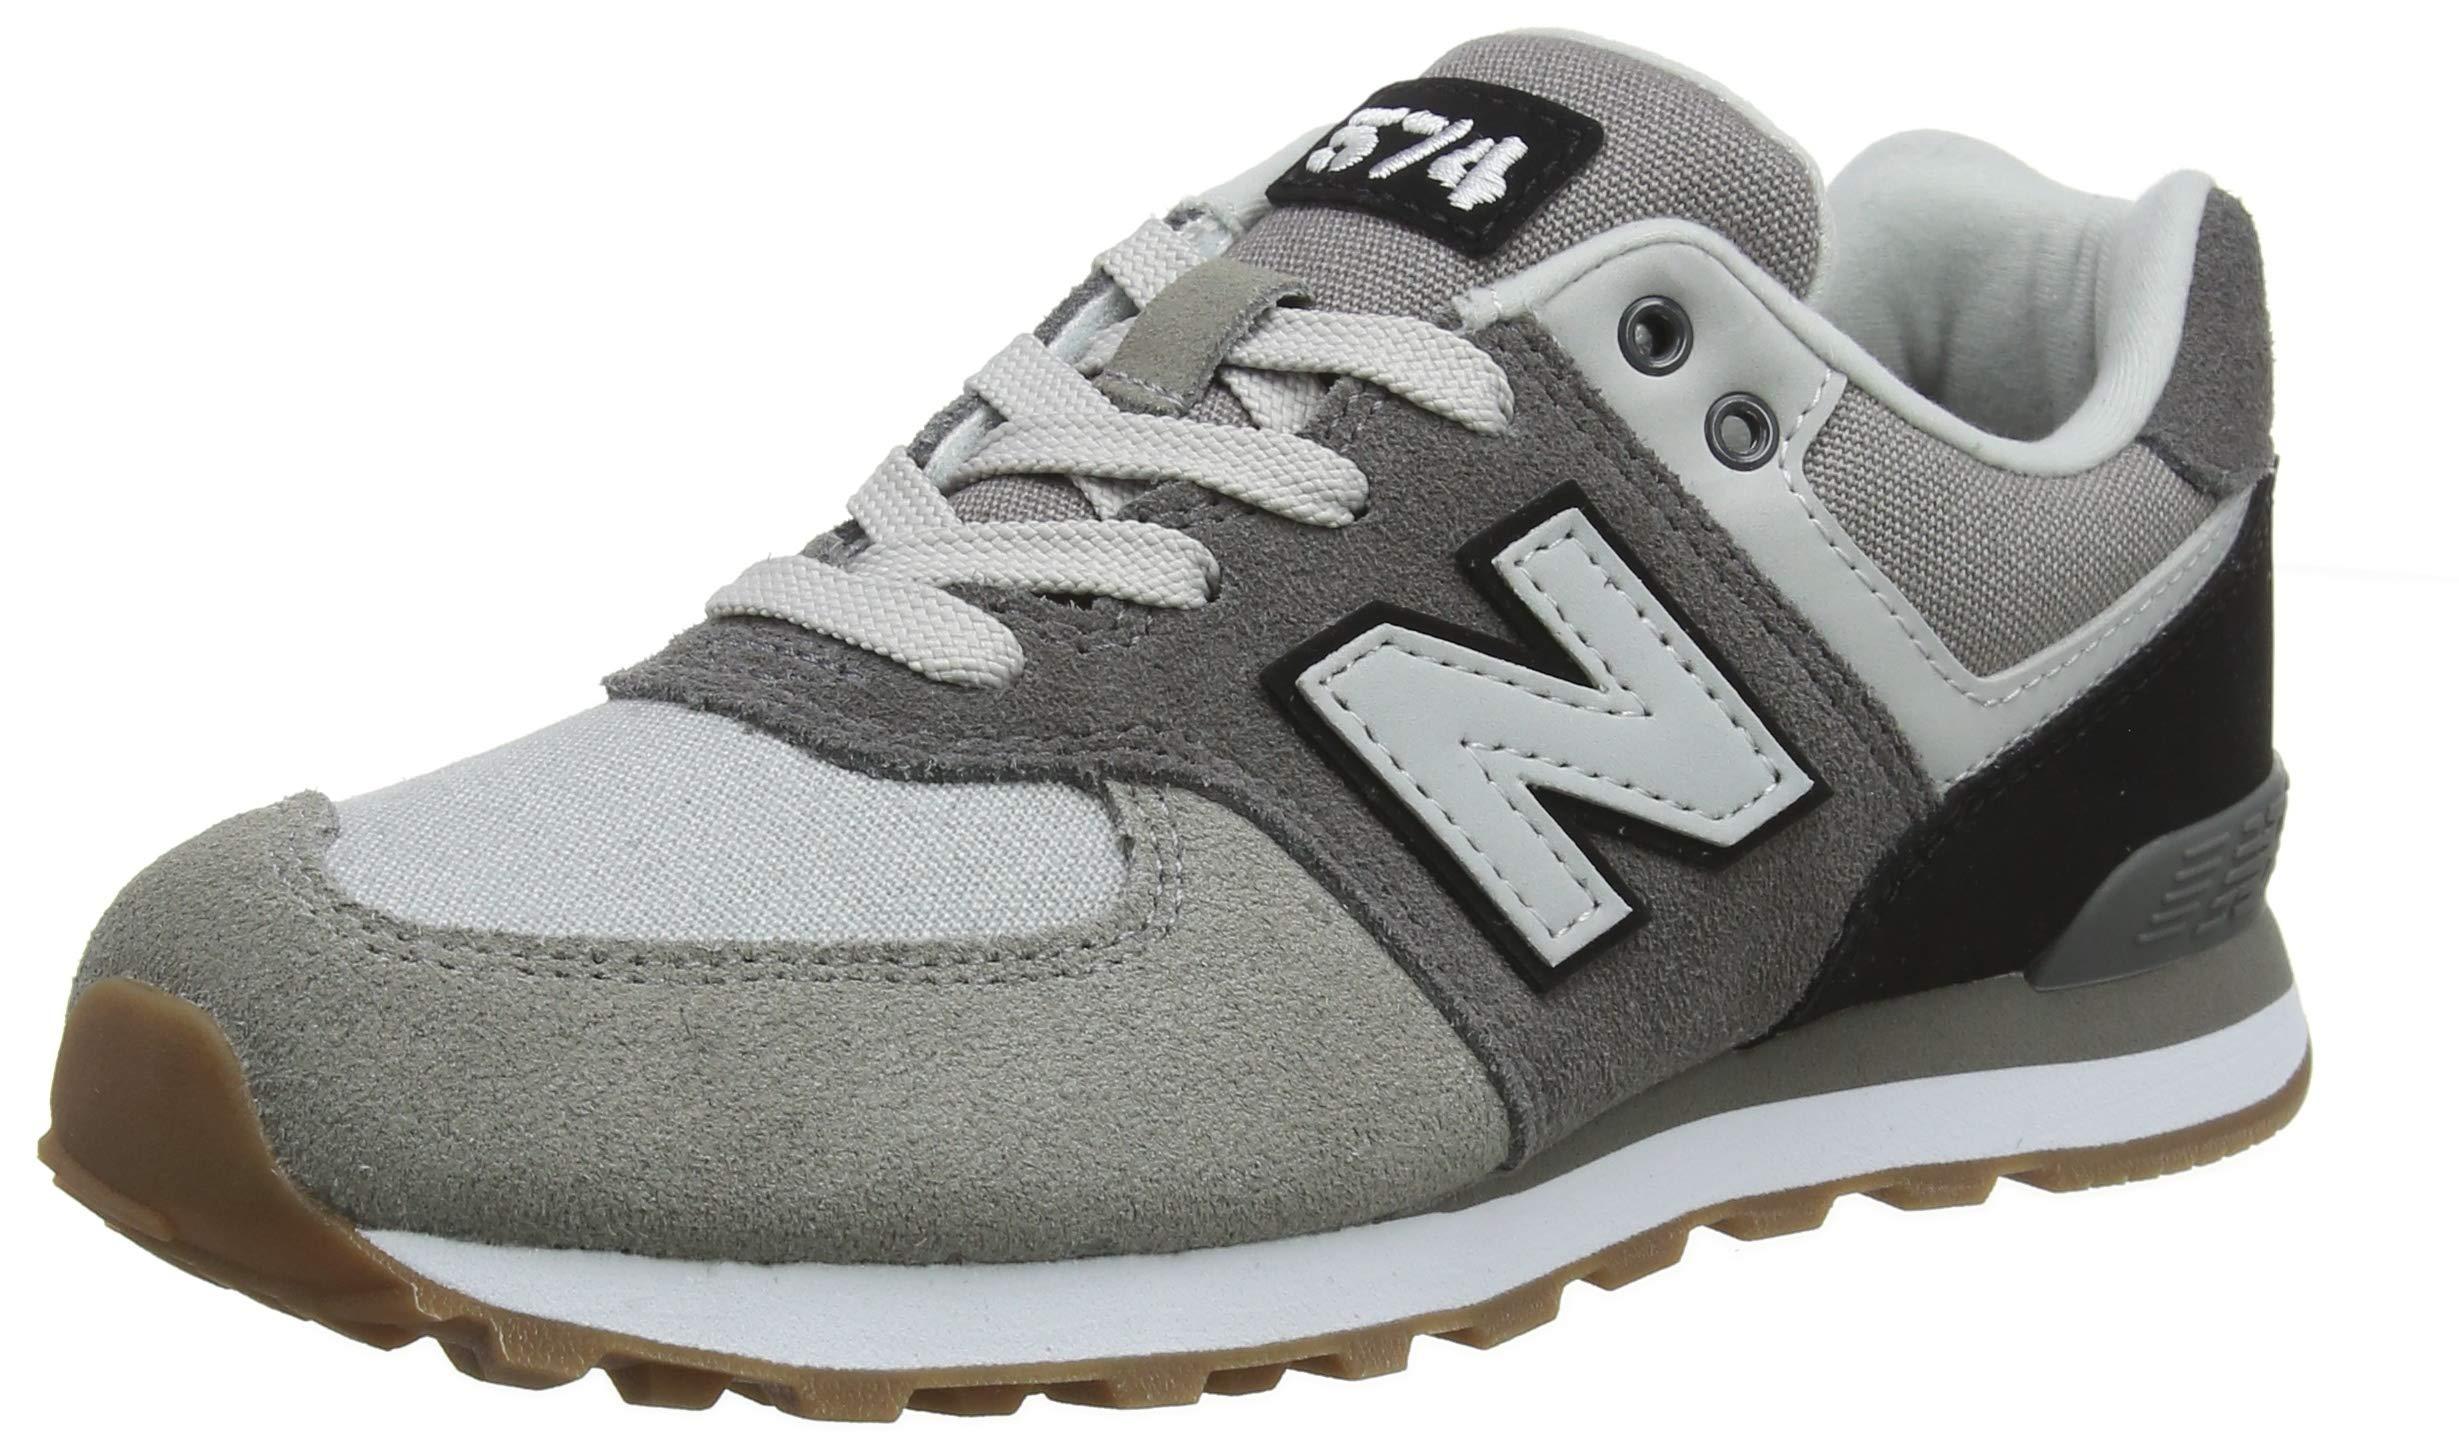 New Balance Boys' Iconic 574 Sneaker Castle Rock/Black 12.5 M US Little Kid